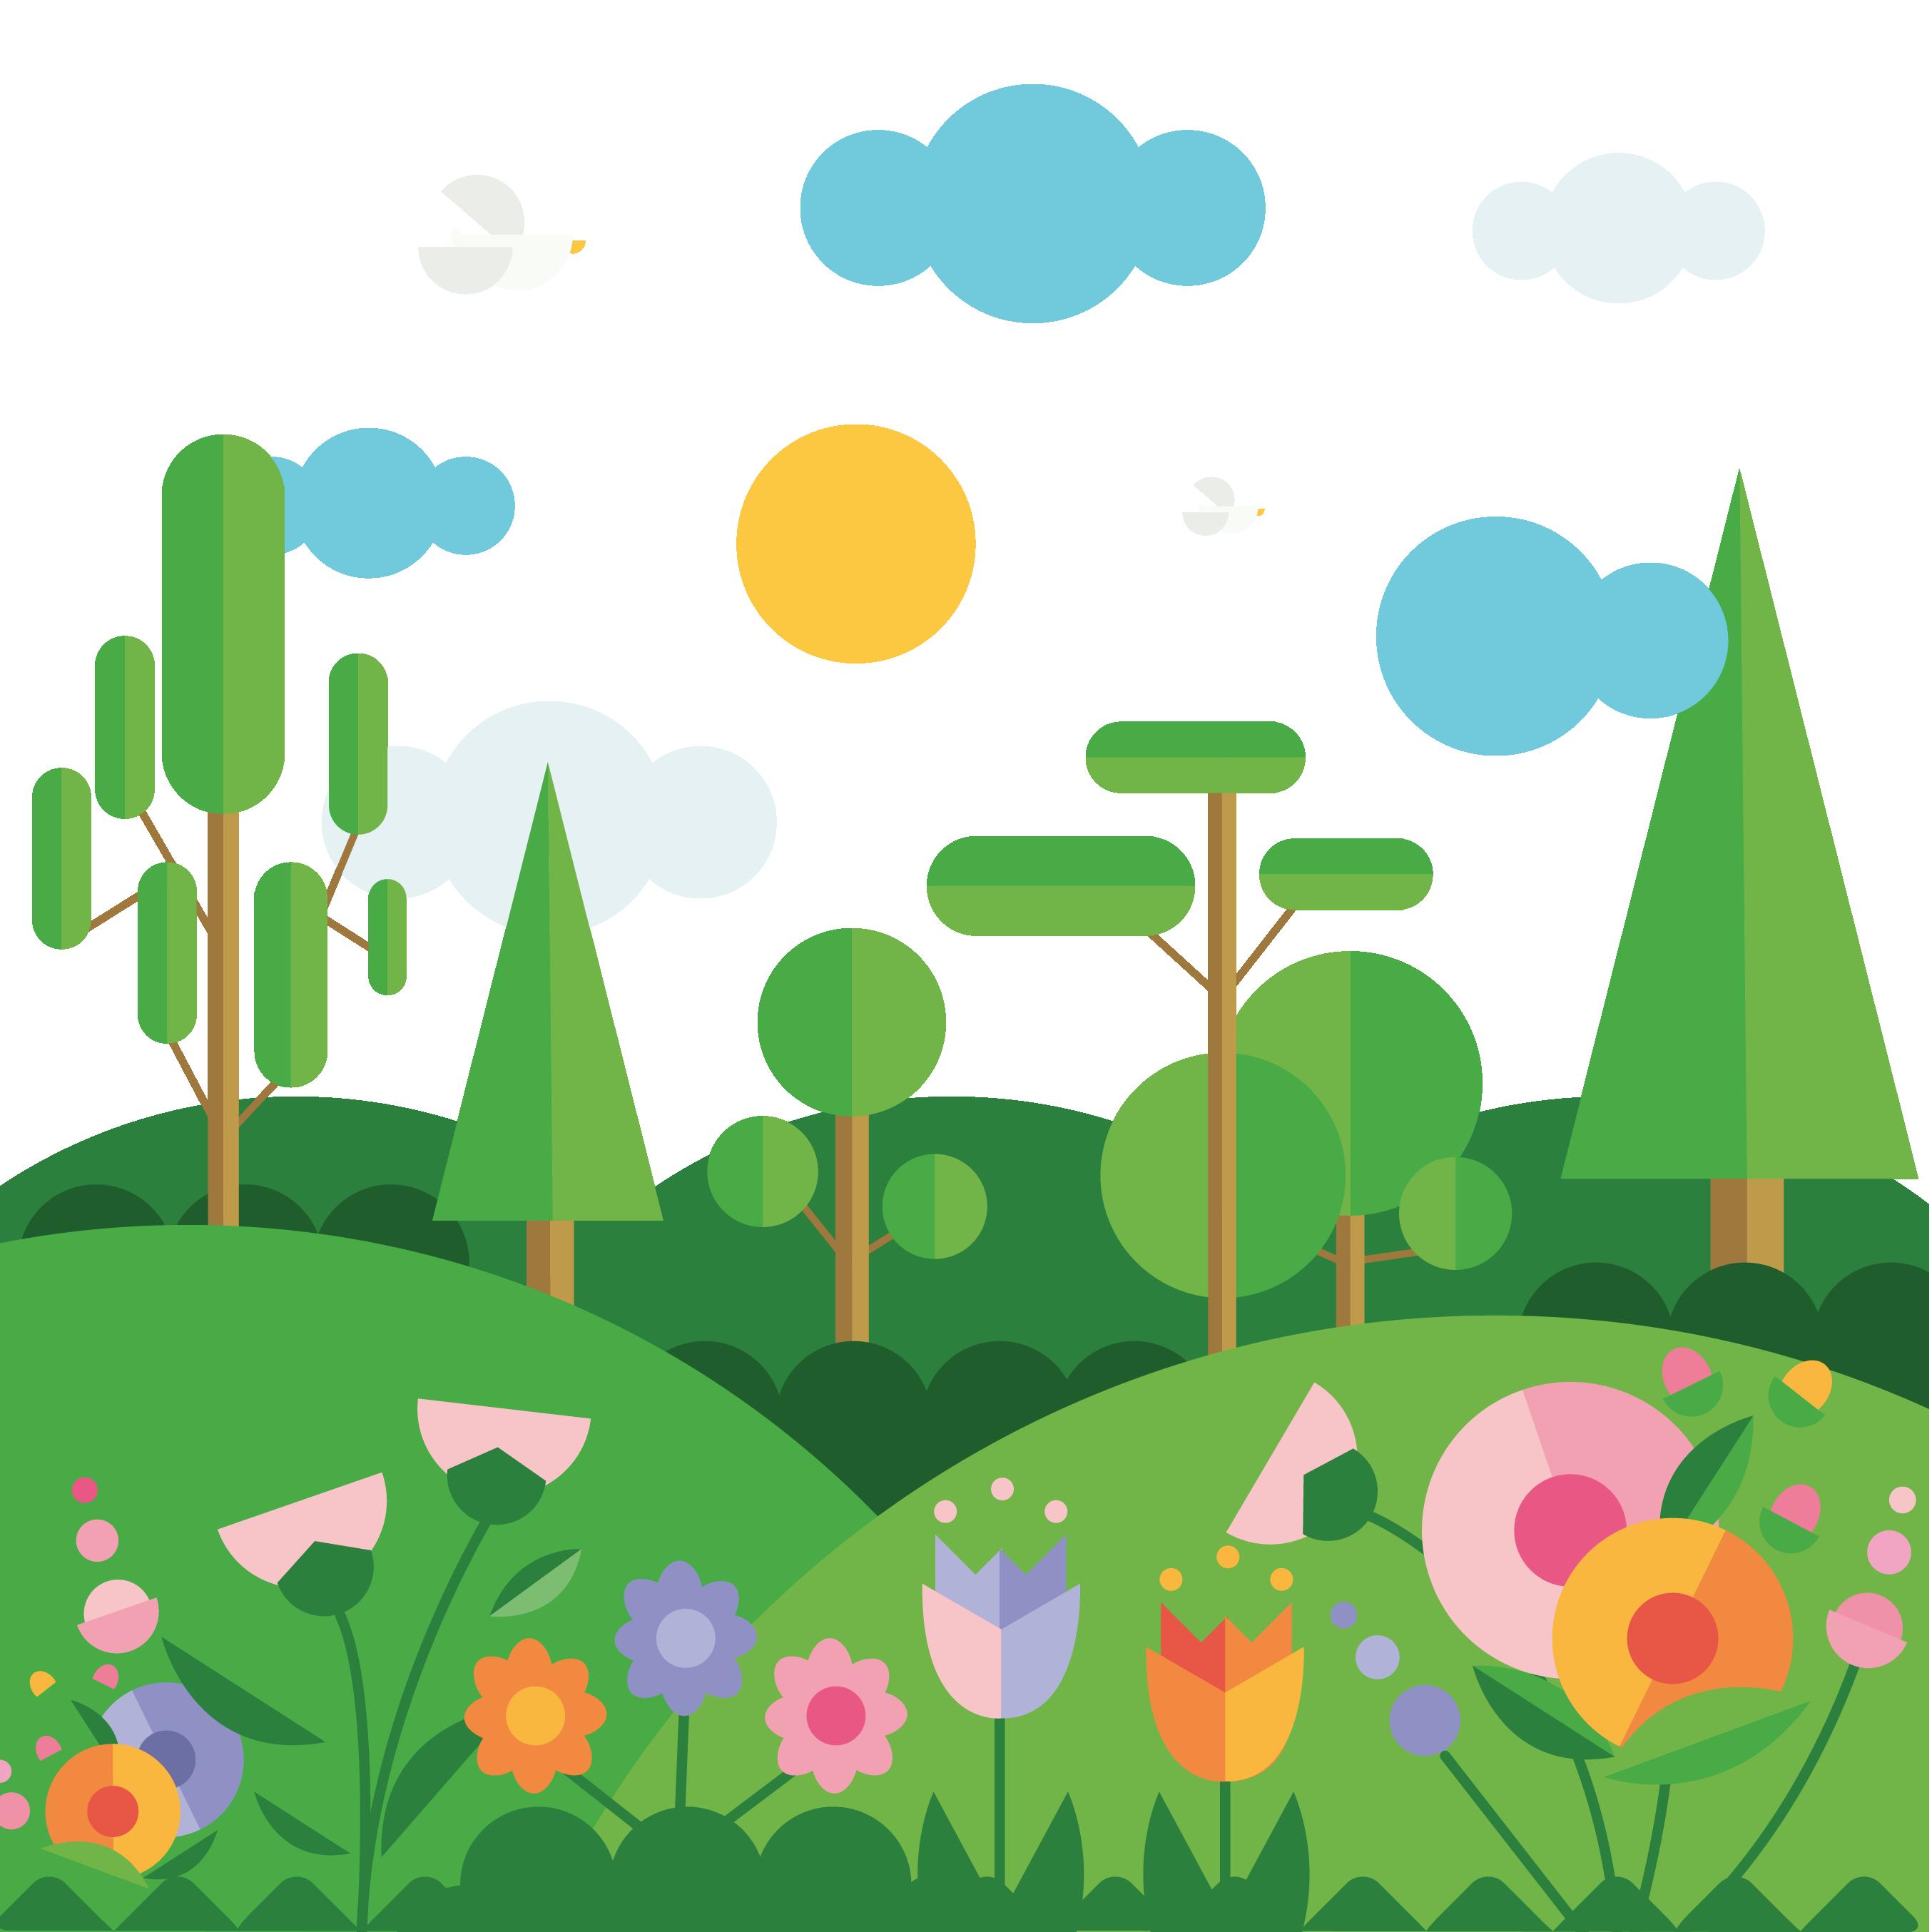 Flat spring mountain vector. Landscaping clipart design landscape